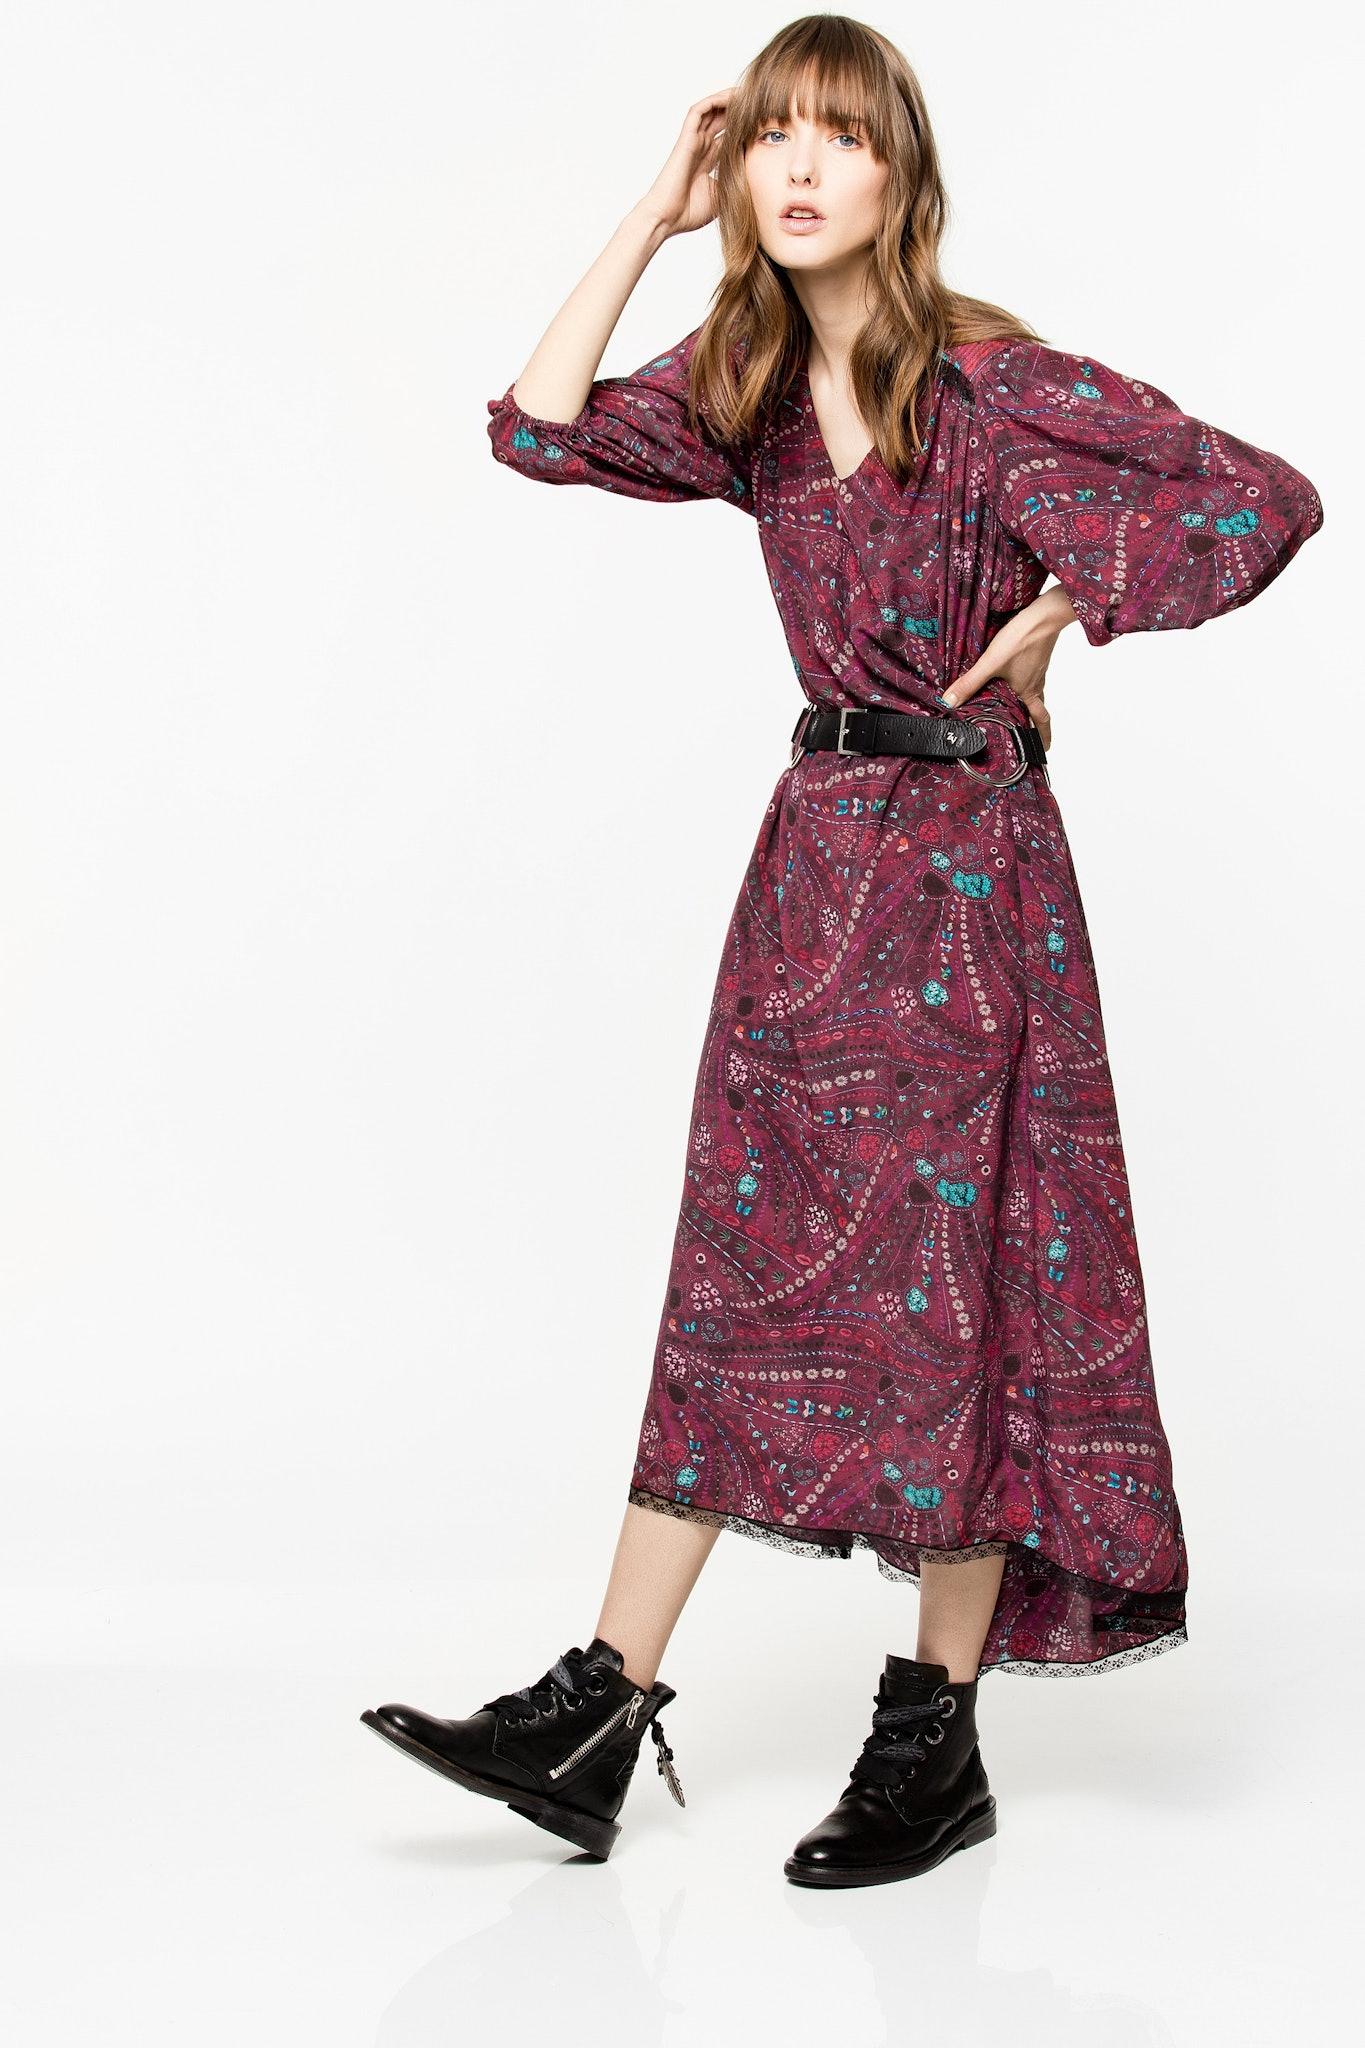 Rafael Psyche dress